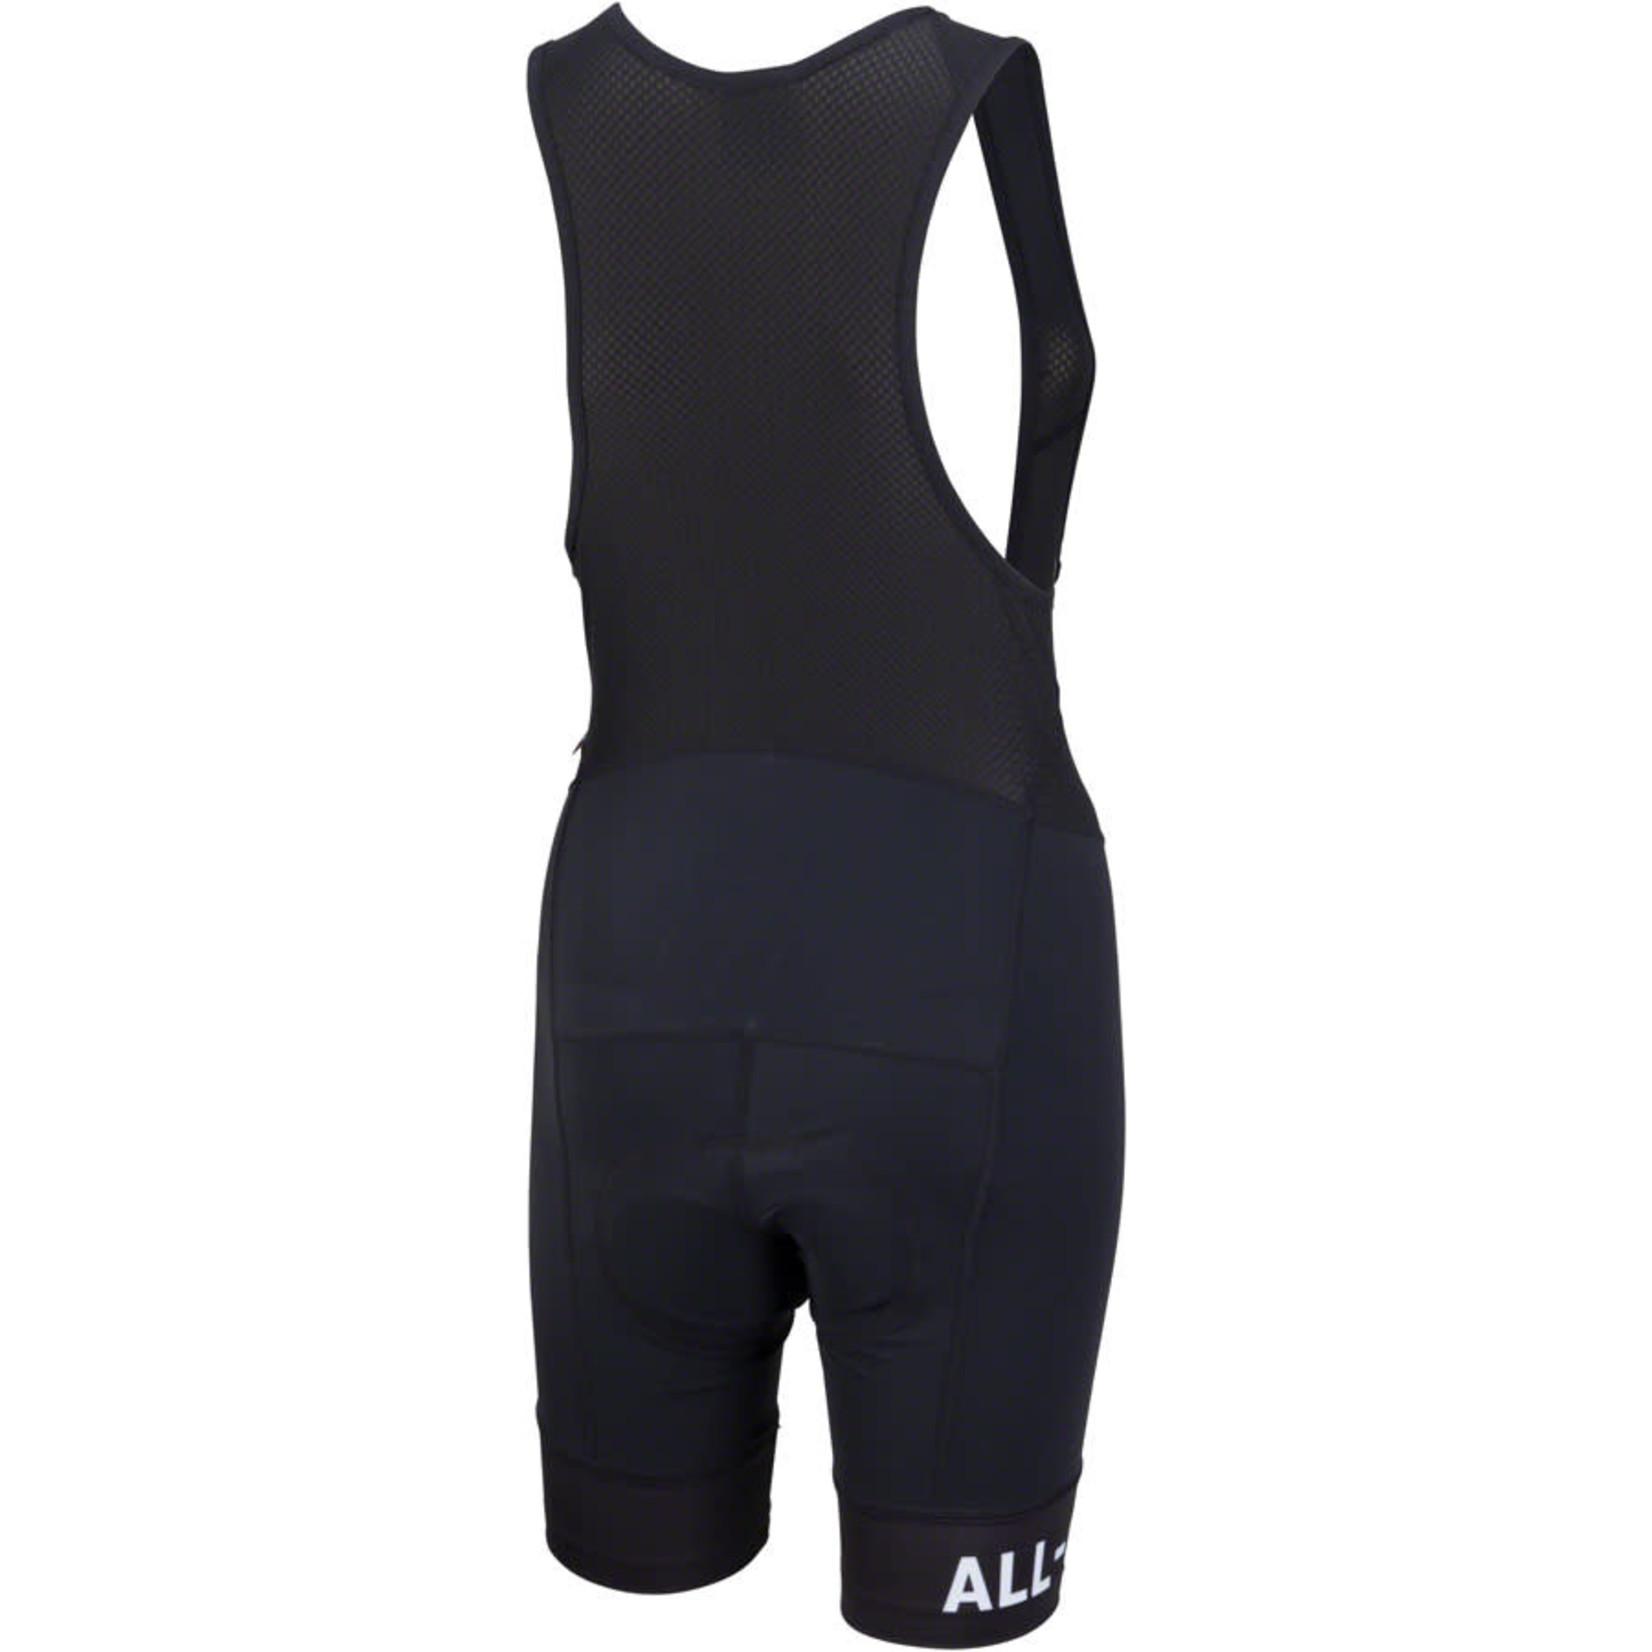 All-City All-City Perennial Women's Bib Short: Black XL